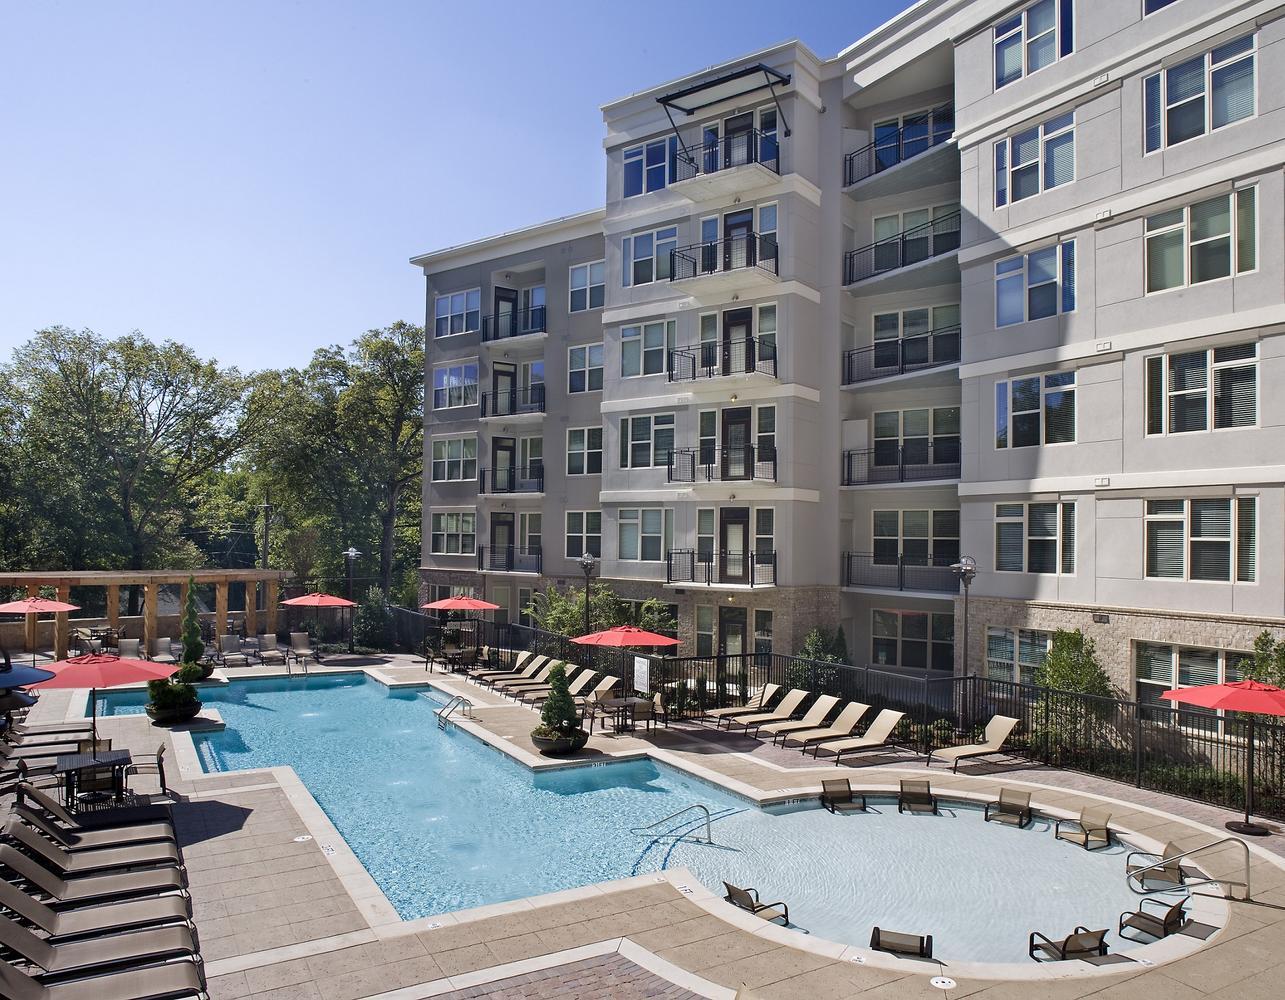 Gables Midtown | Gables Residential Communities